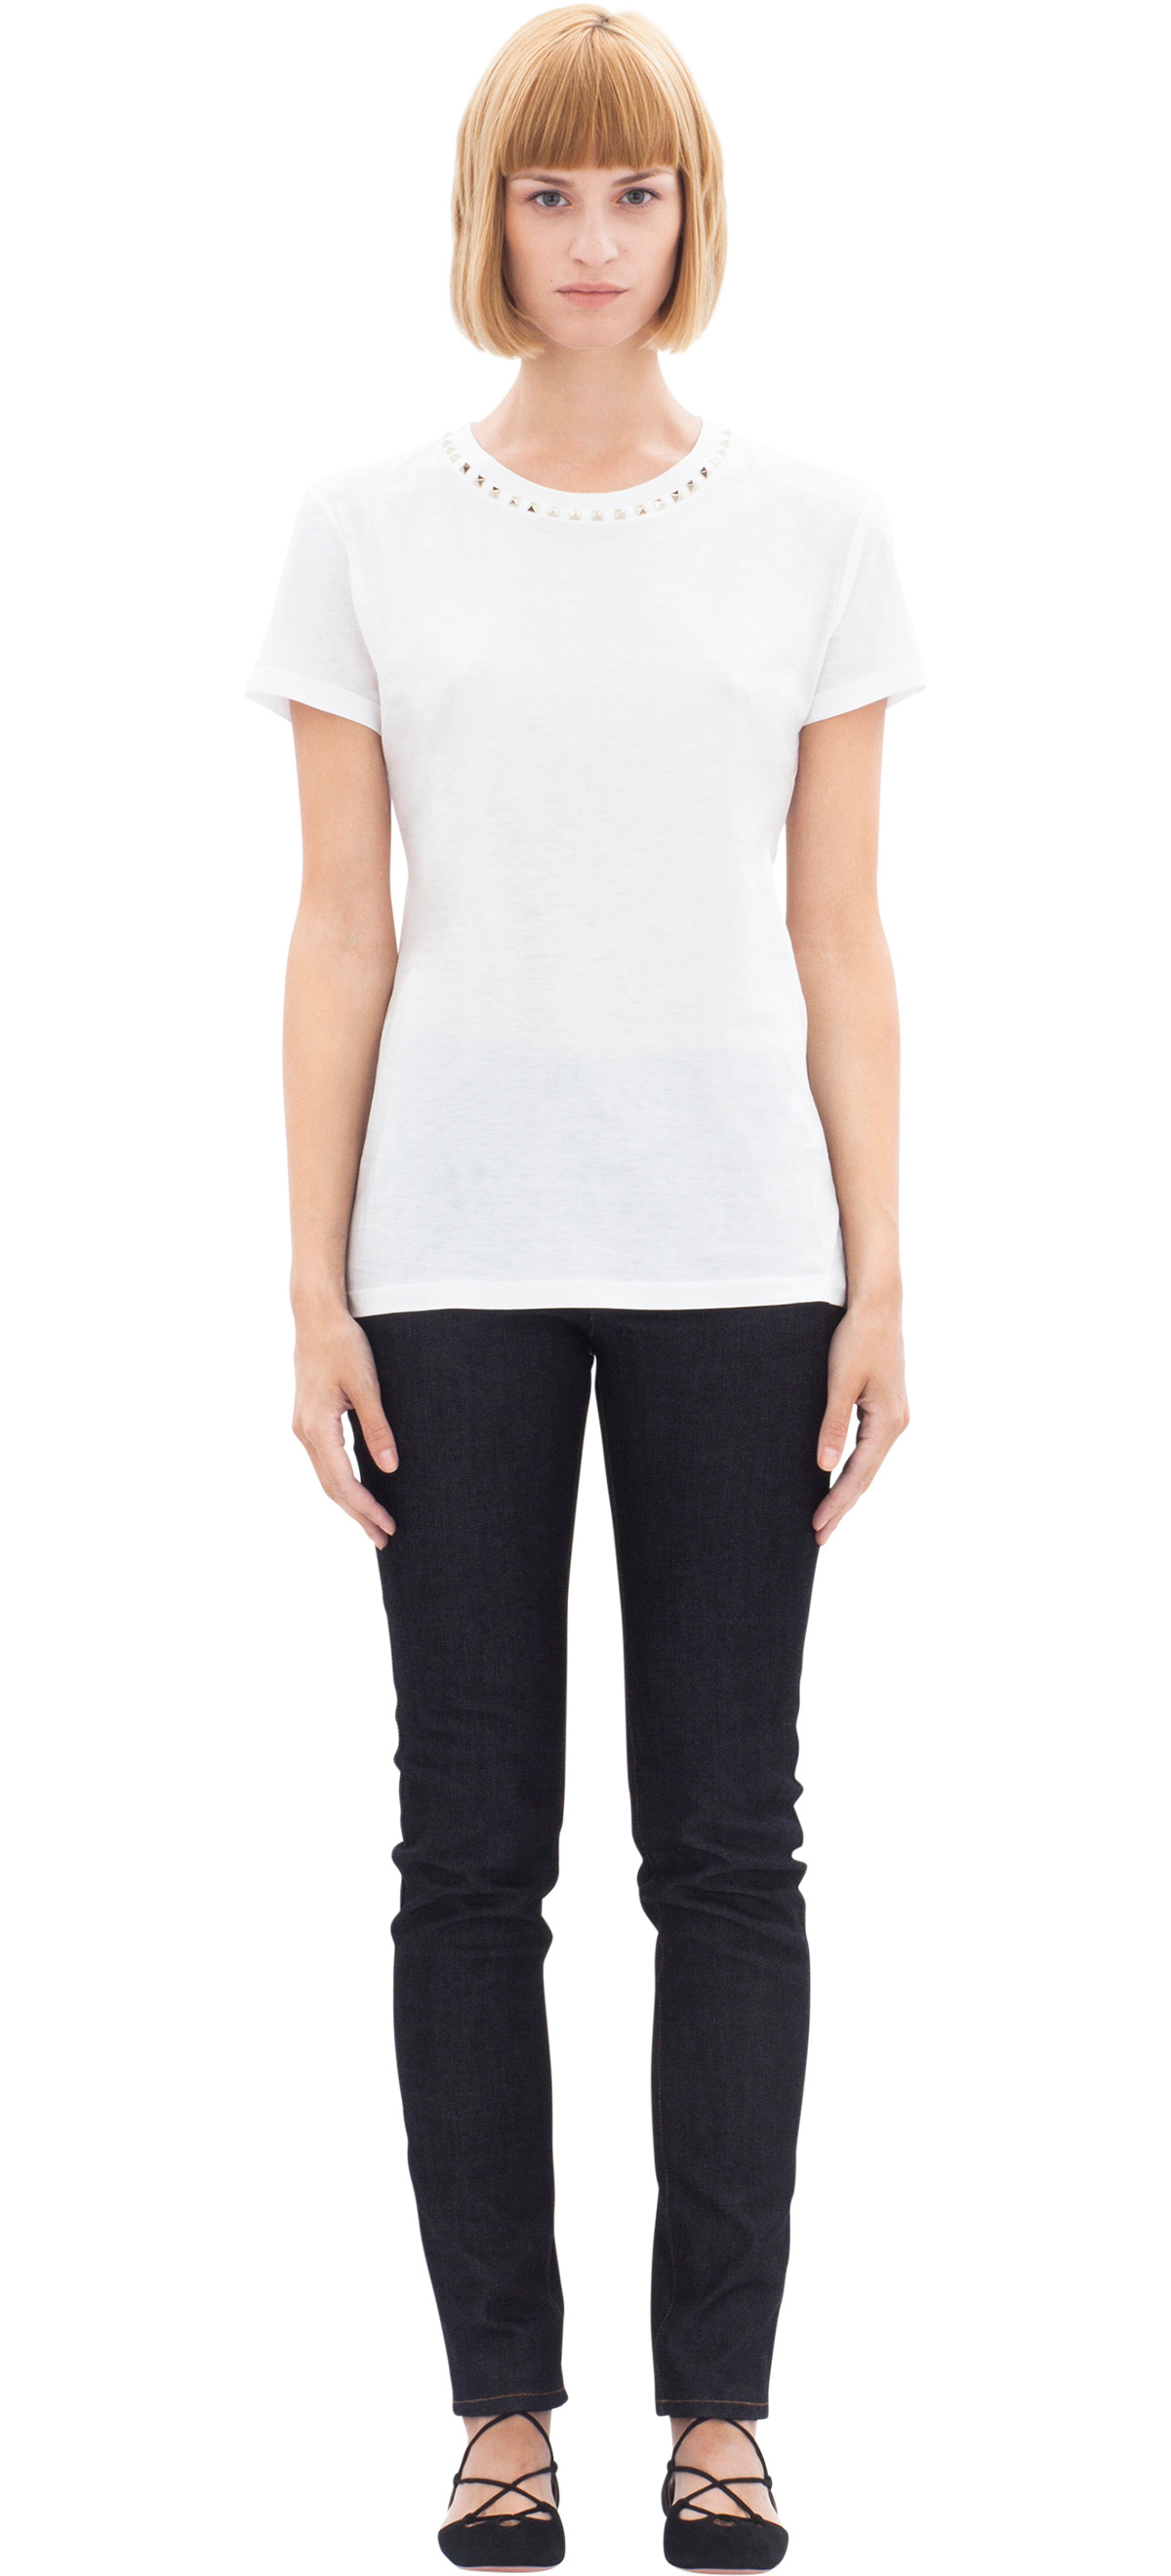 Valentino t shirt w studs around collar in black lyst for Dress shirt studs uk